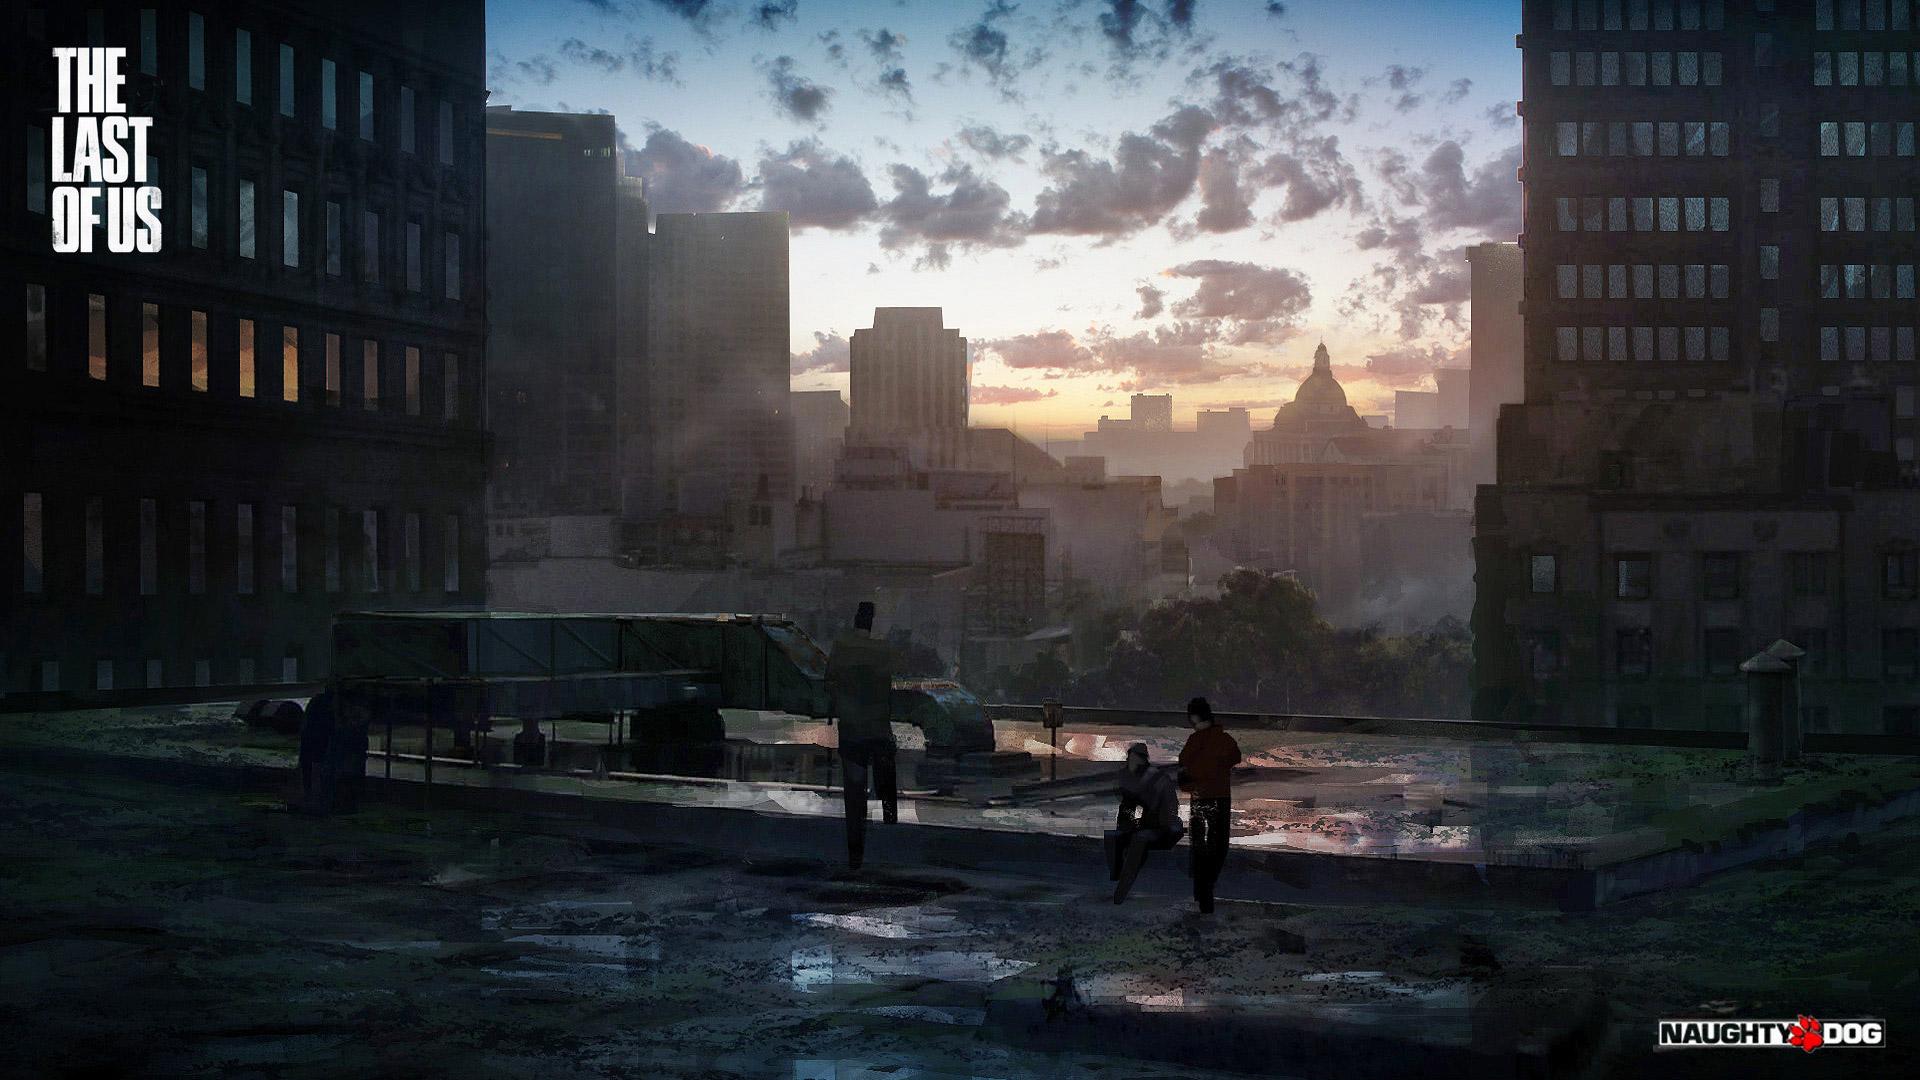 The Last of Us wallpaper 22